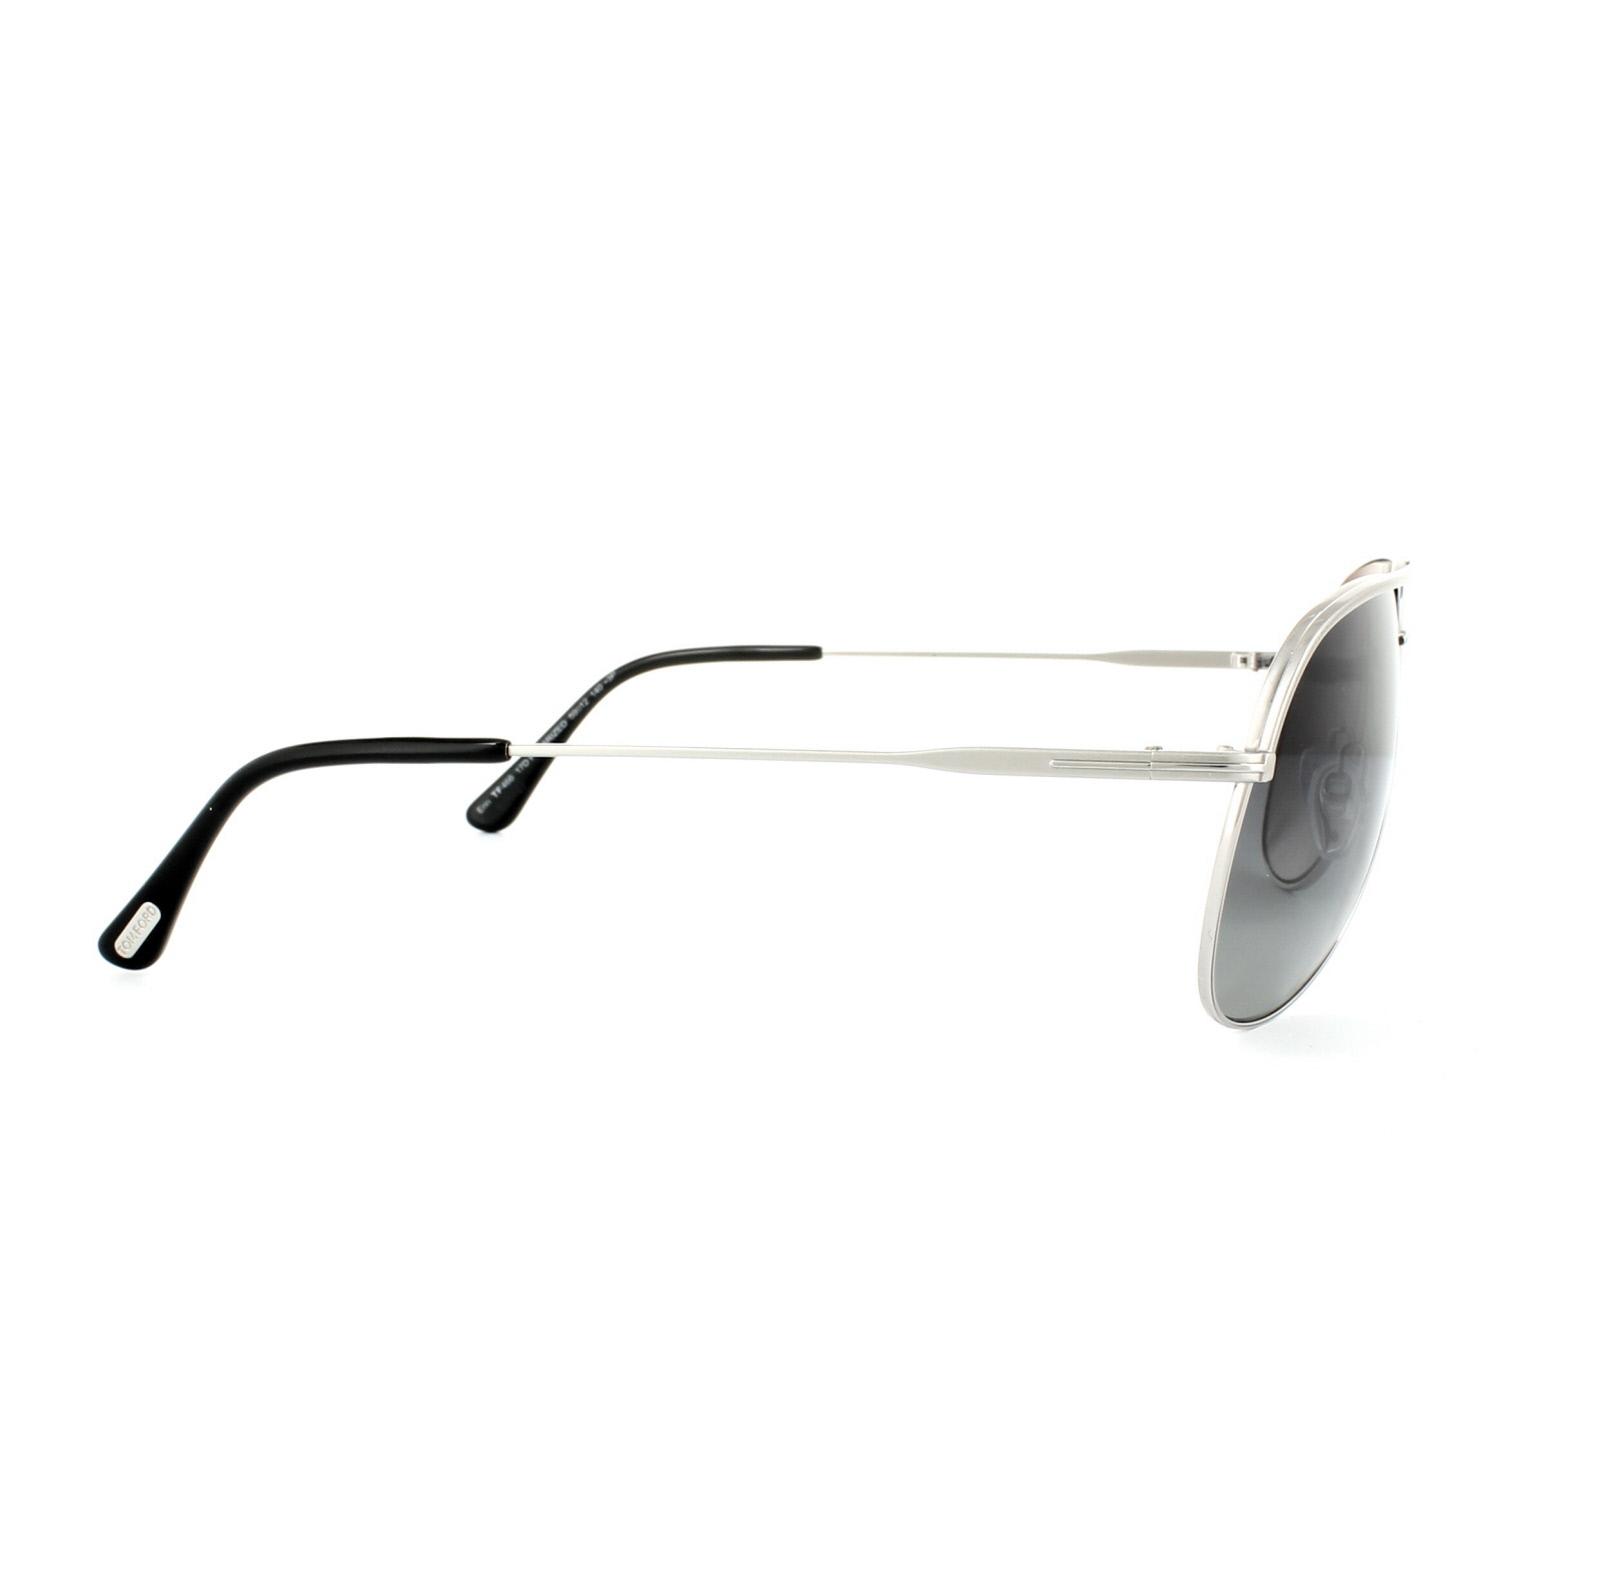 ad61a12e5c6 Sentinel Tom Ford Sunglasses 0466 Erin 17D Matt Palladium Smoke Grey  Polarized